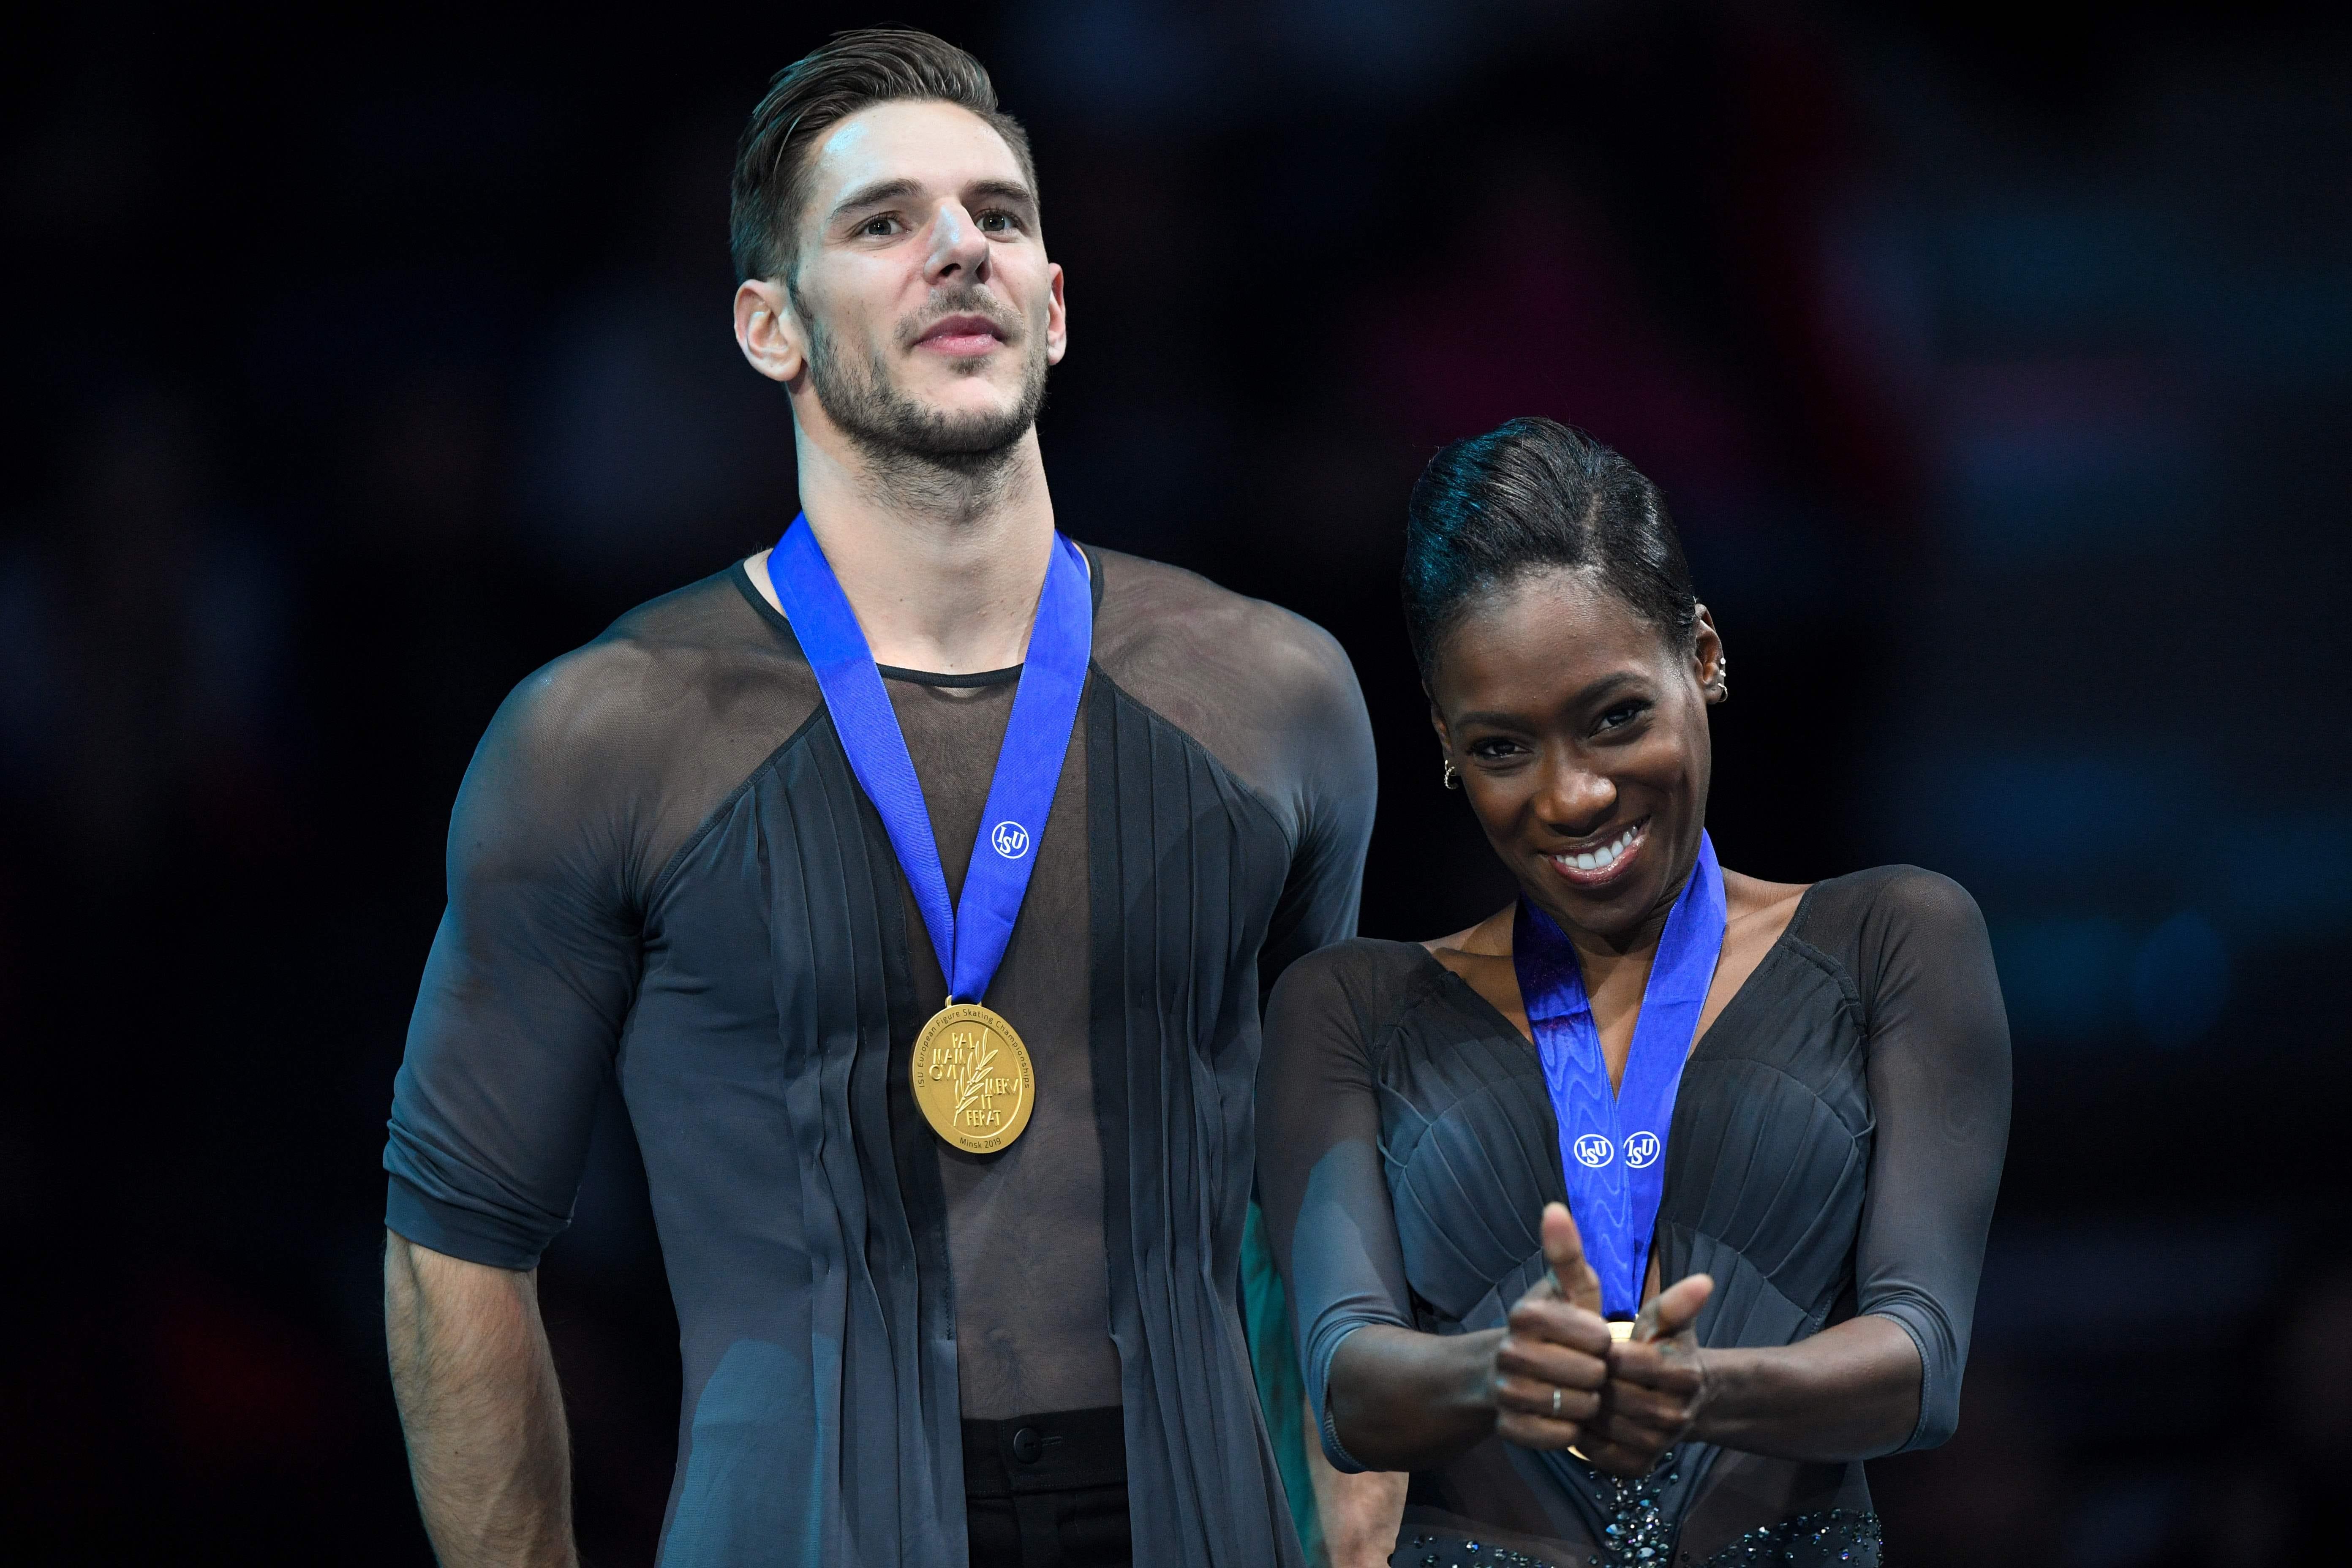 Olympic skater Morgan Cipres under investigation retires